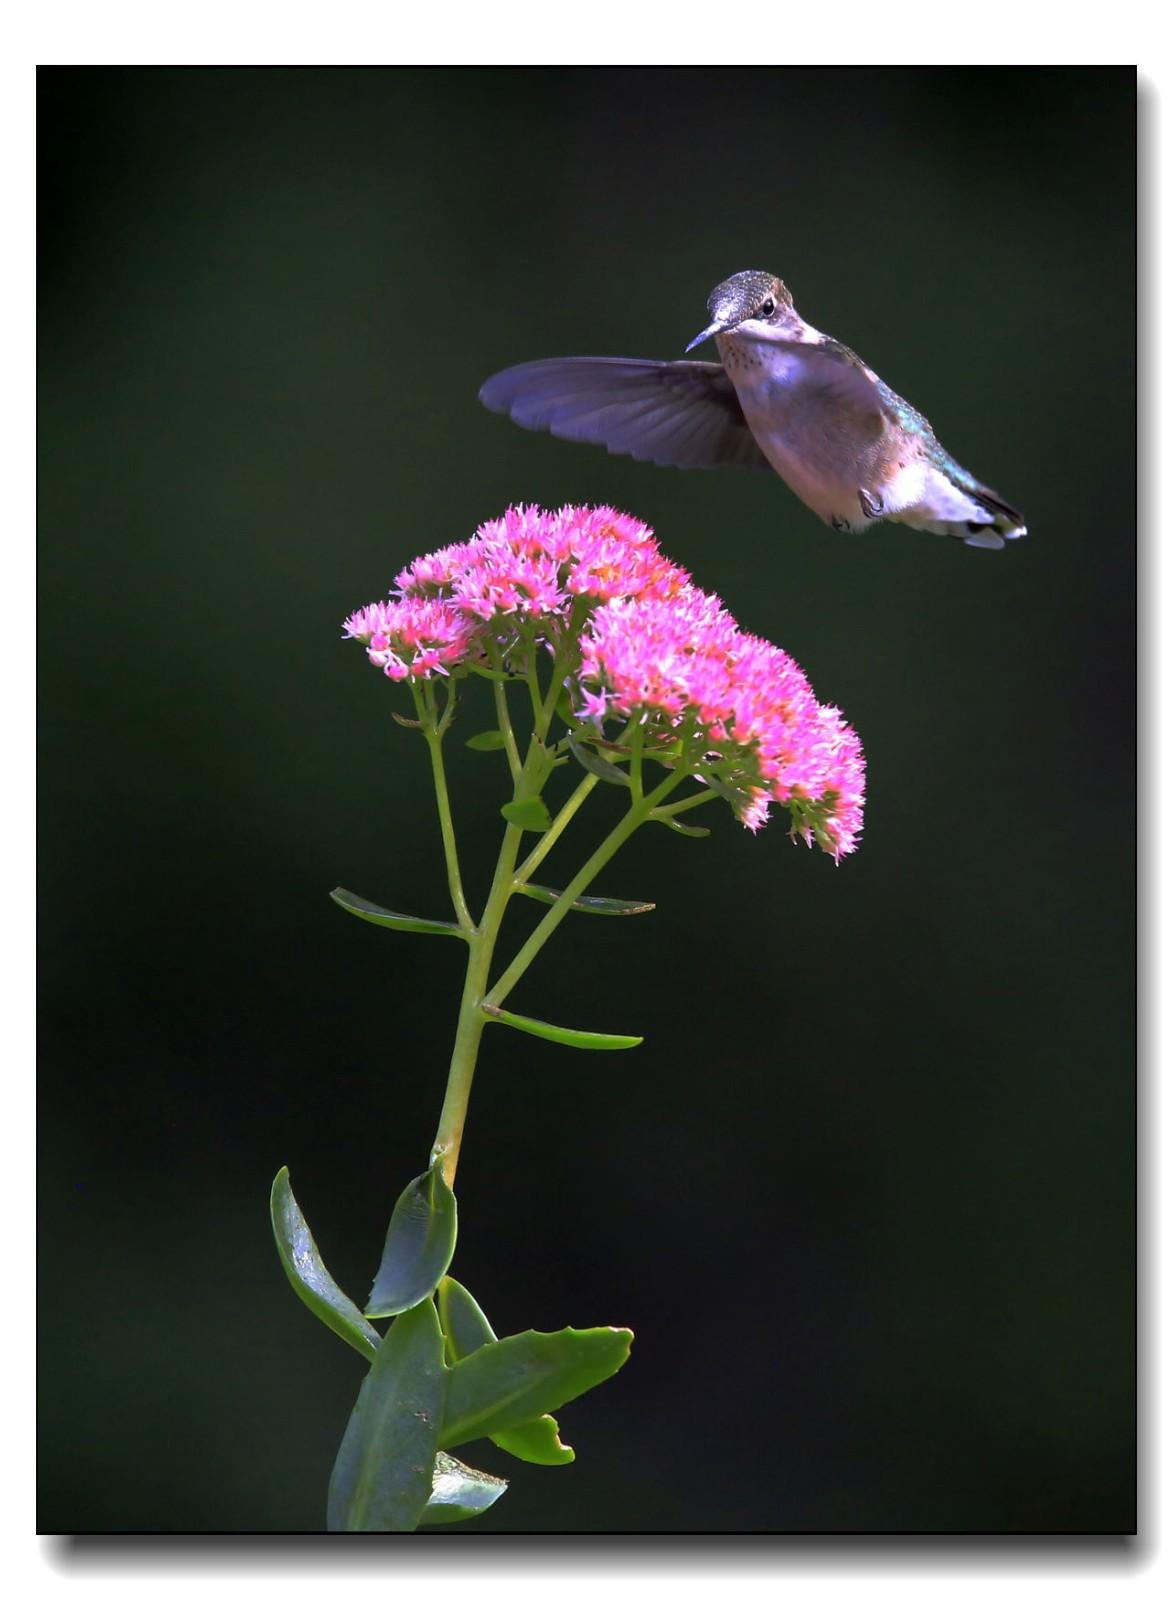 蜂鸟组图(六)_图1-10